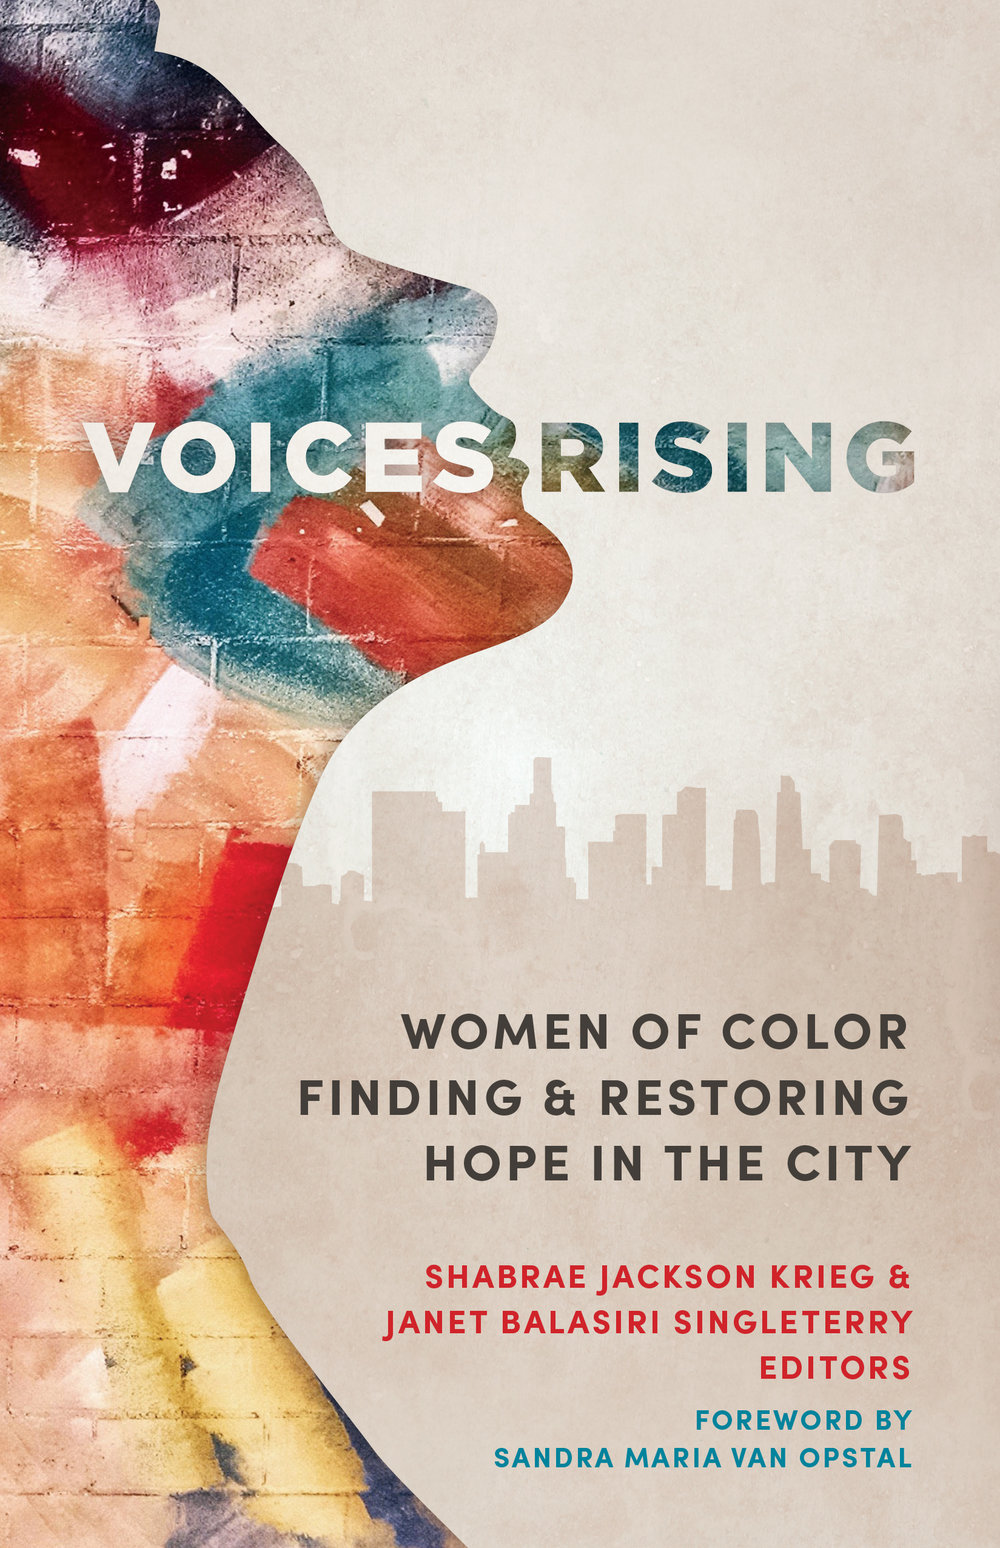 VoicesRising-cover-18-10-01.jpg